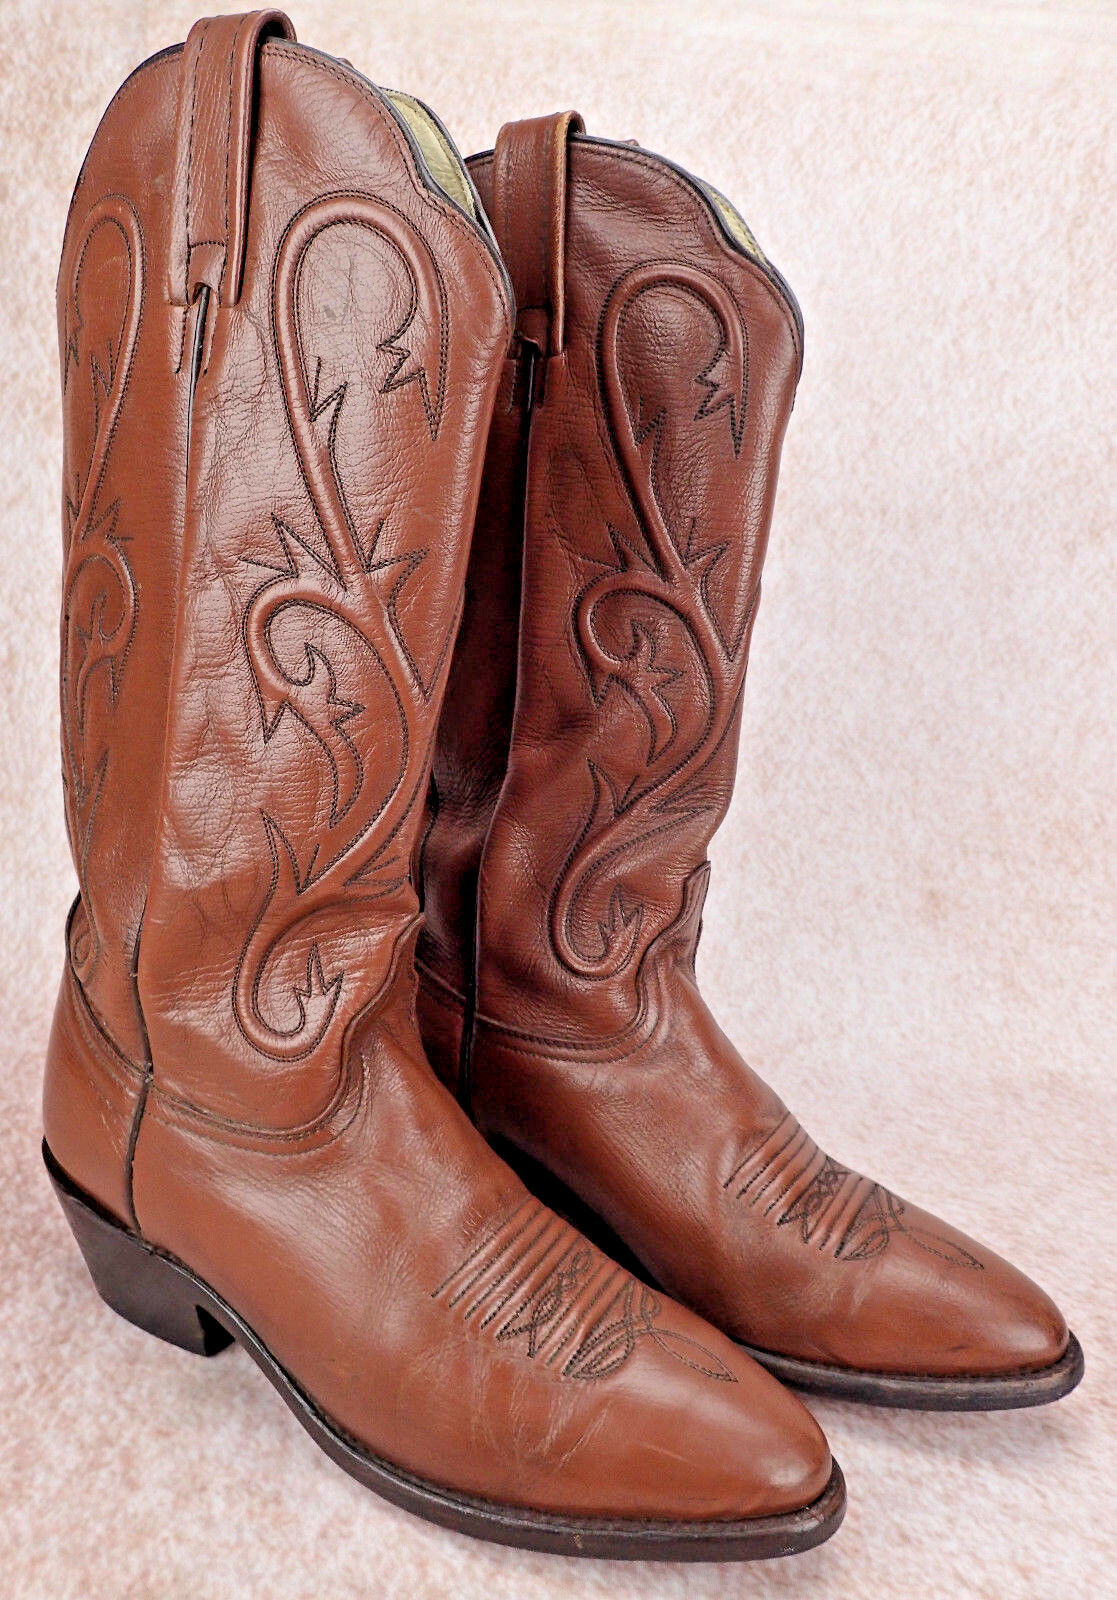 DAN POST Cowboy Western Boot Antique Tan Mignon Brown Women's Size 7.5 M